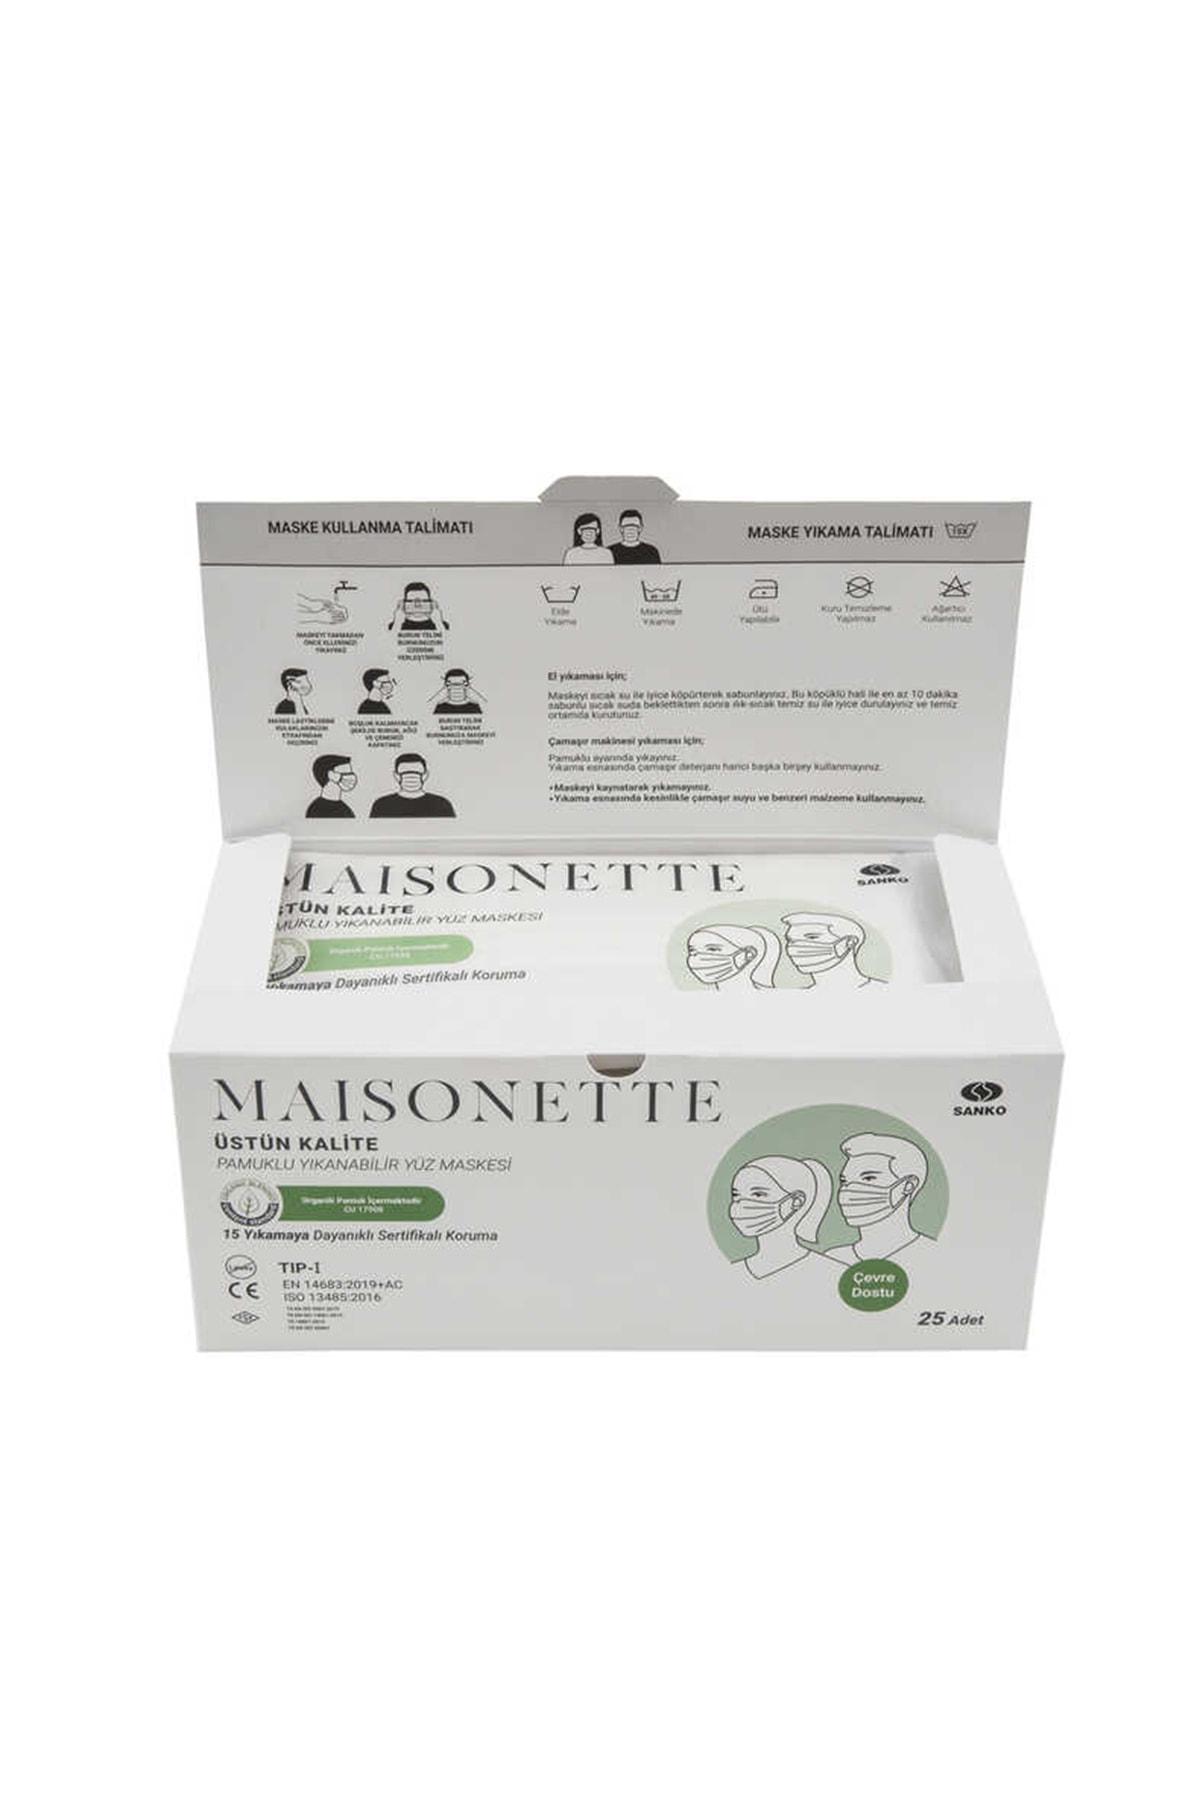 Maisonette Yıkanabilir Pamuklu Yüz Maskesi 25 li Paket 1